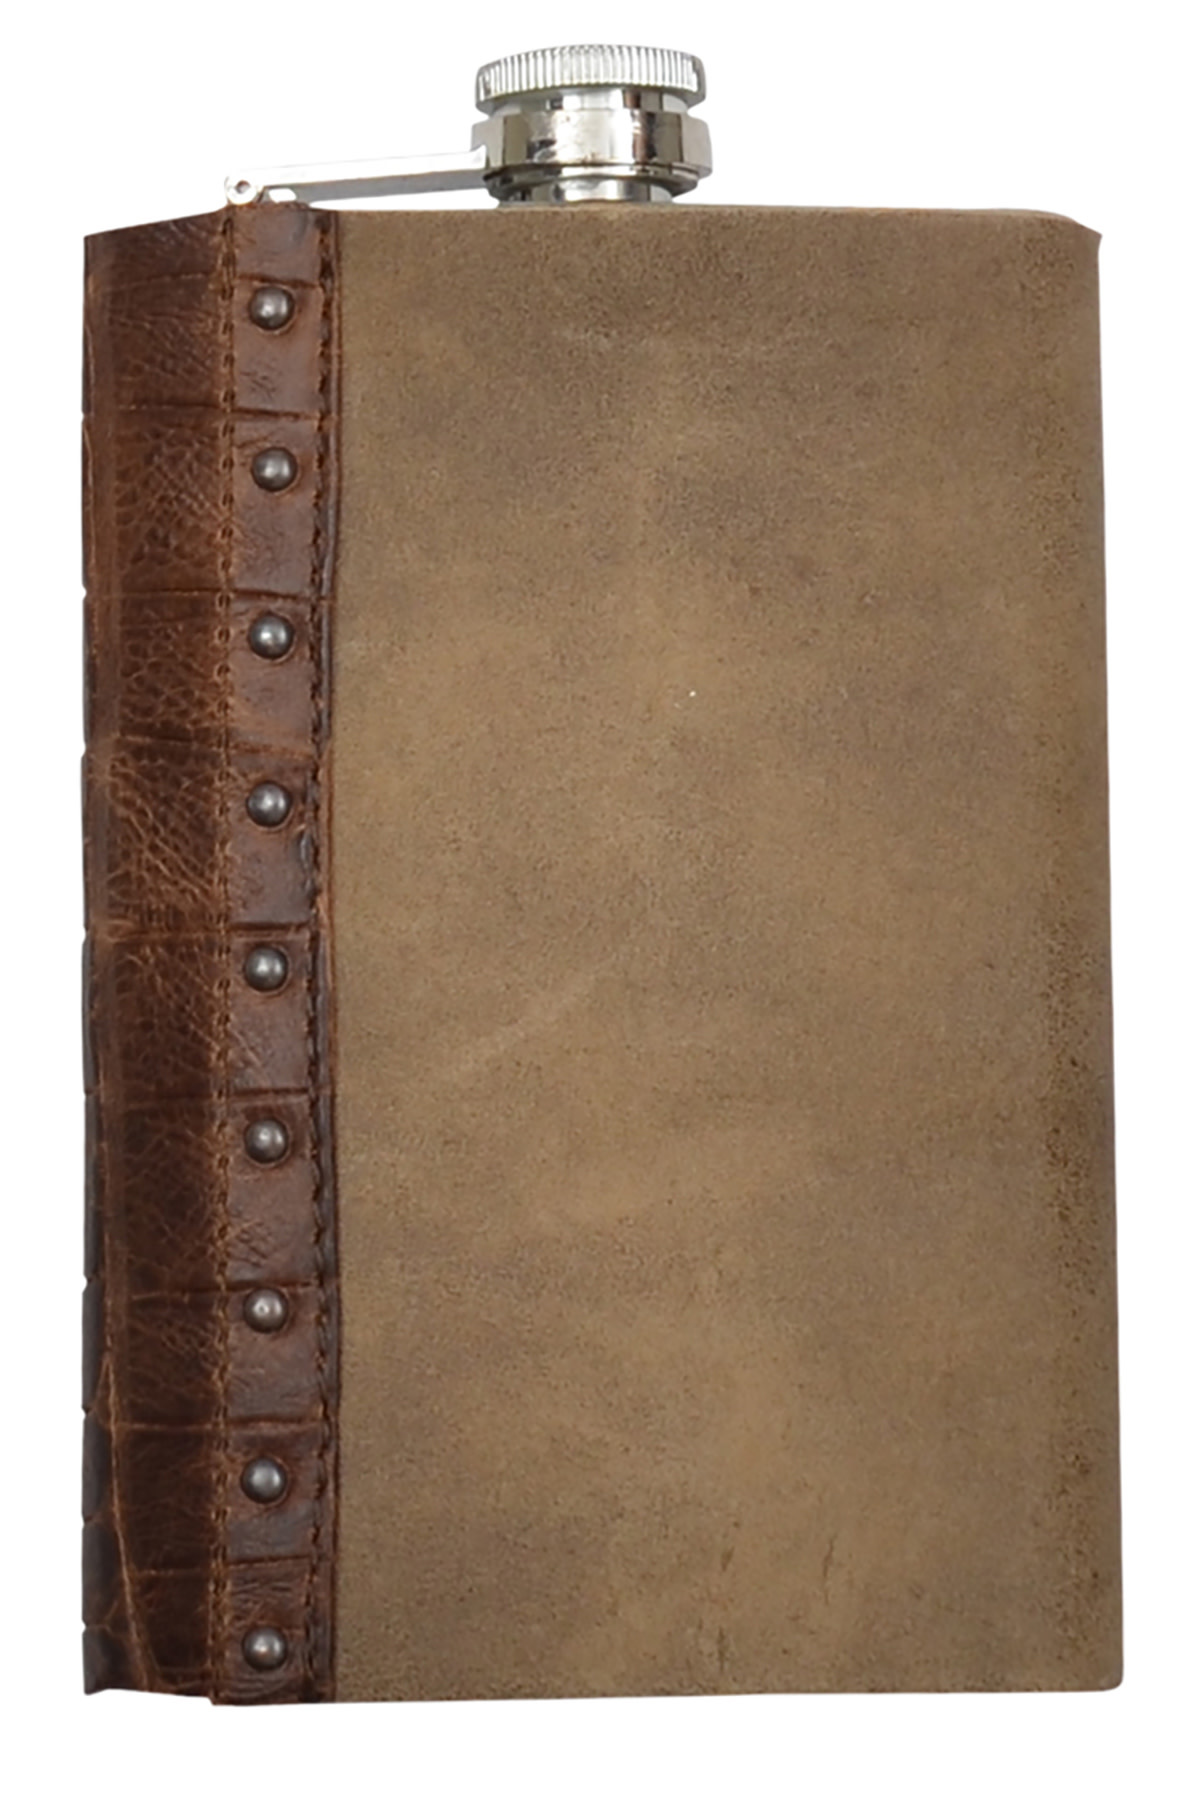 Flask - Distressed Leather Jacket